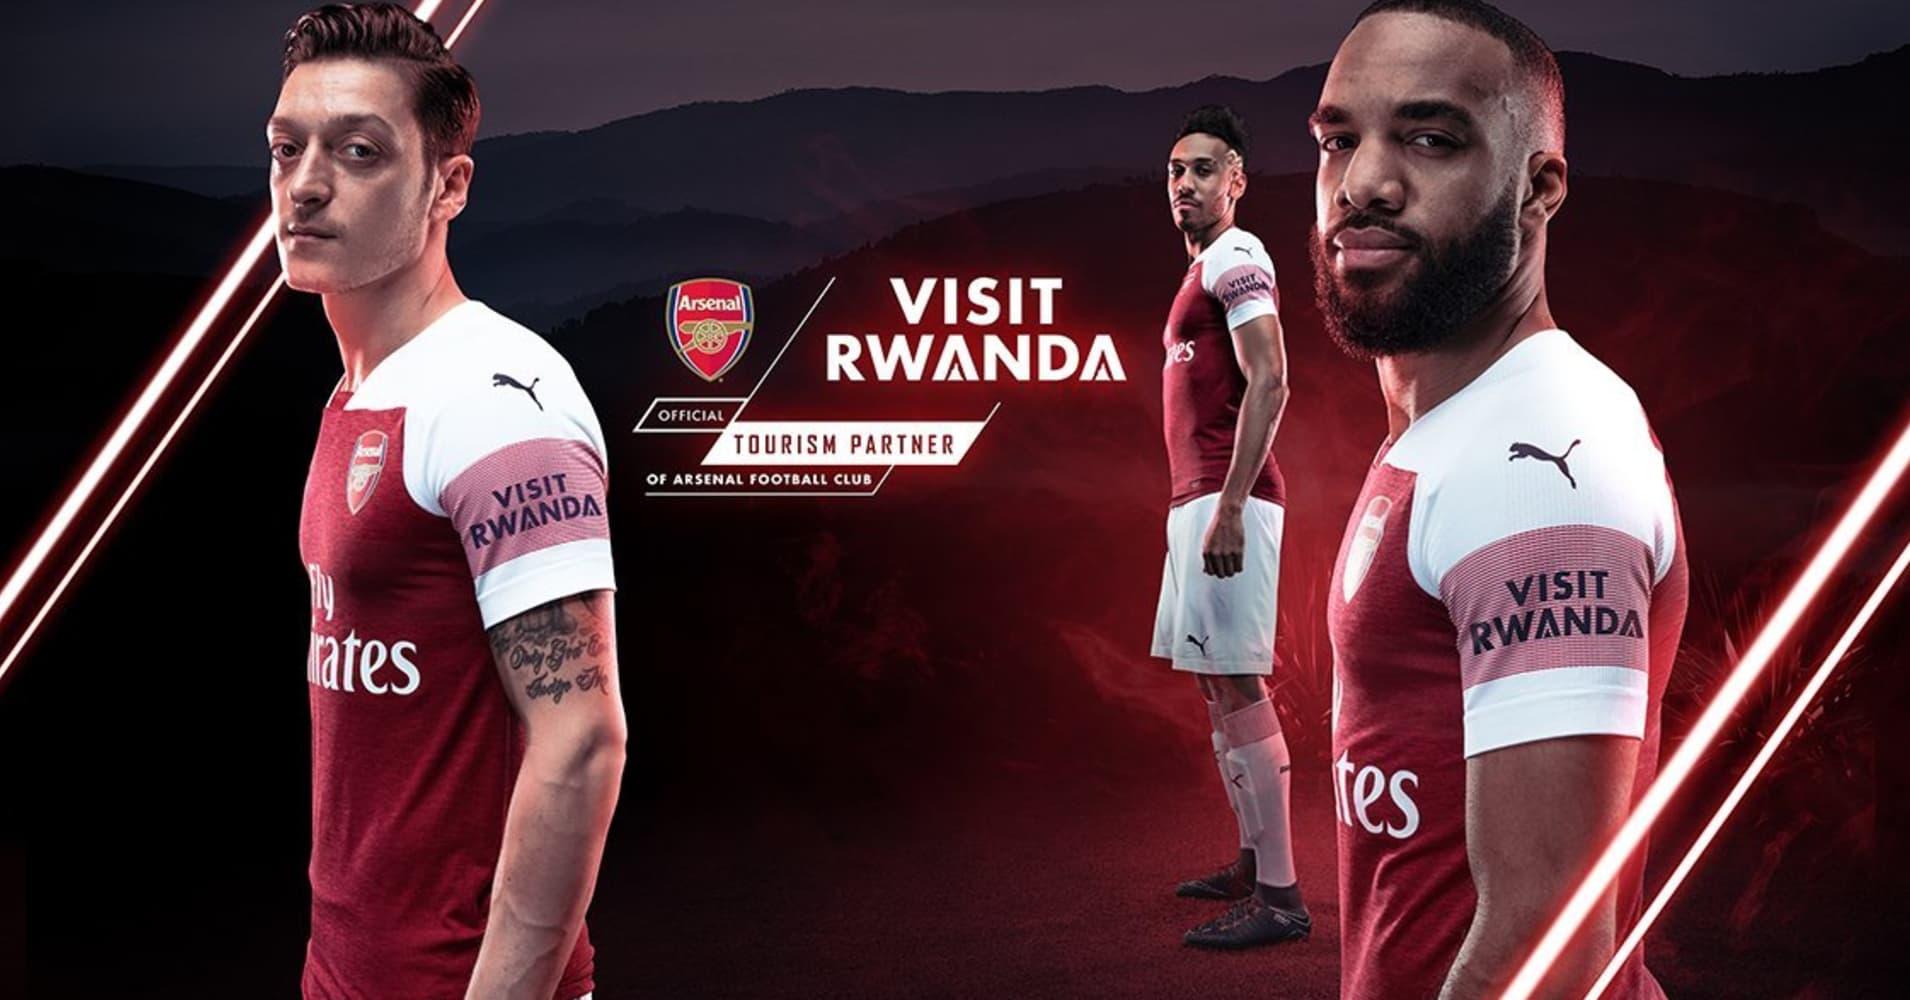 Arsenal caught in sponsorship row over Rwanda deal